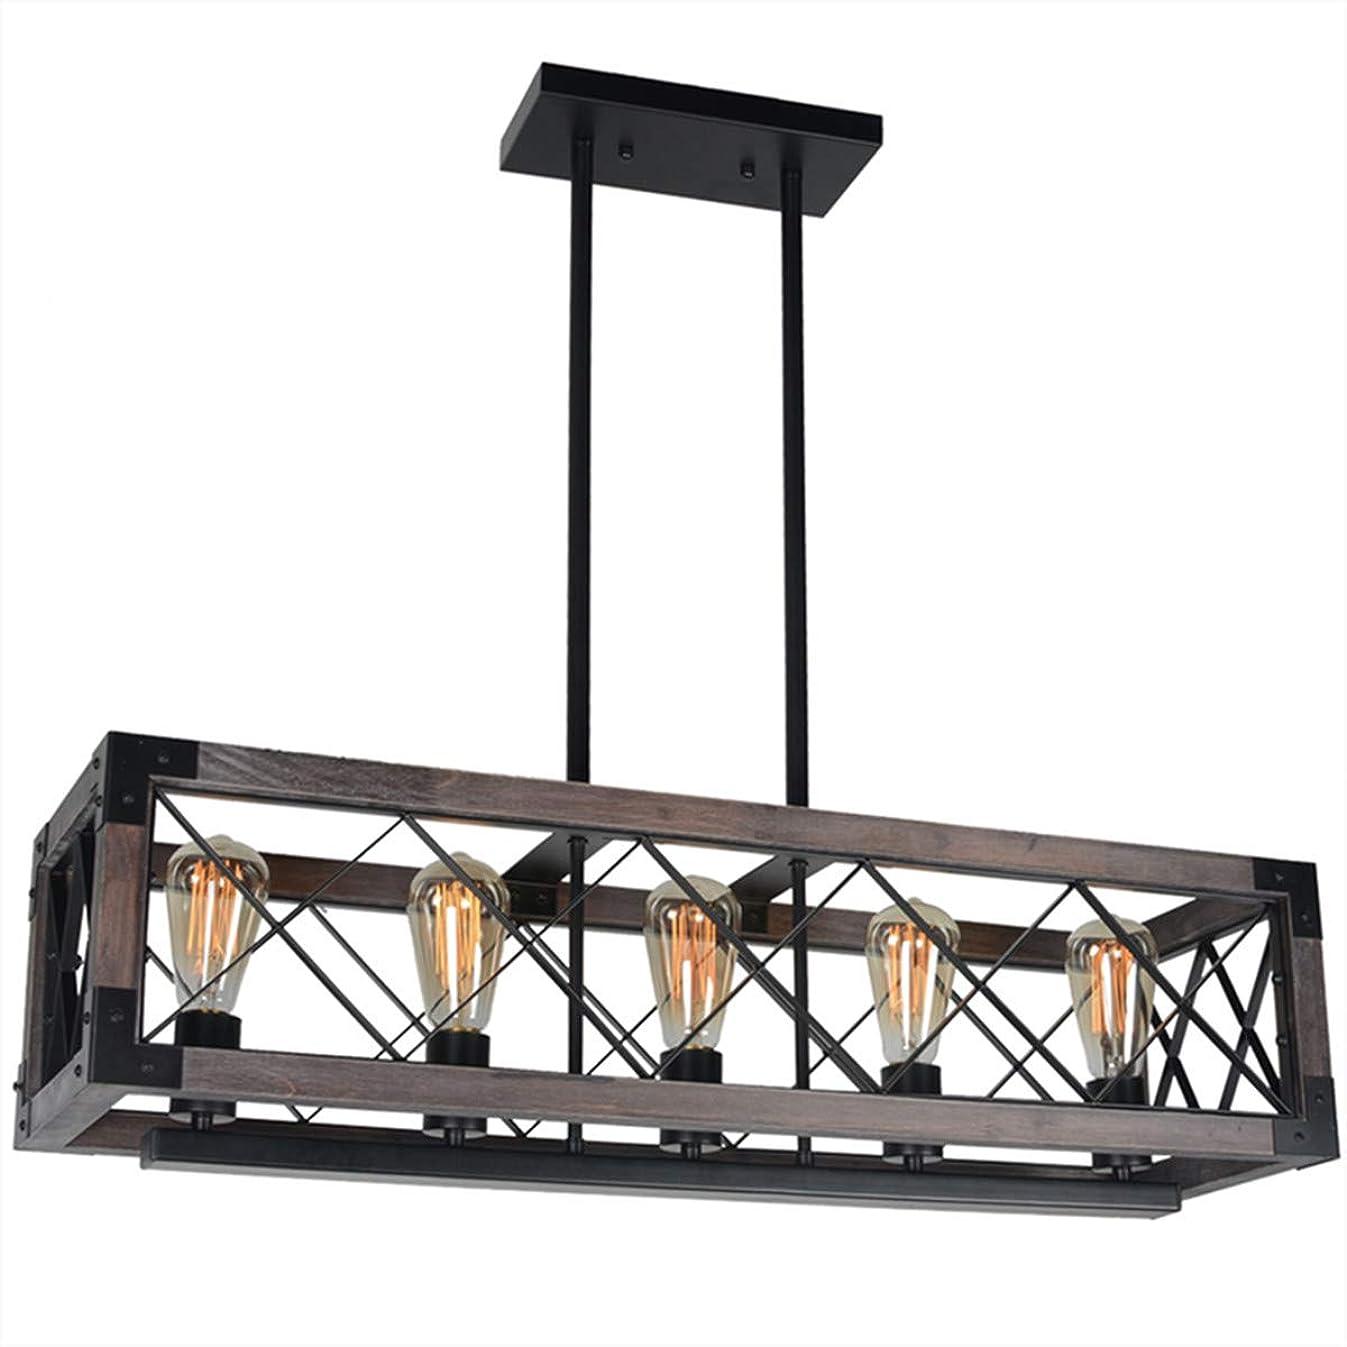 Baiwaiz Rustic Wood Chandelier, Metal Rectangle Dining Room Lighting Farmhouse Kitchen Island Light Fixtures 5 Lights Edison E26 032